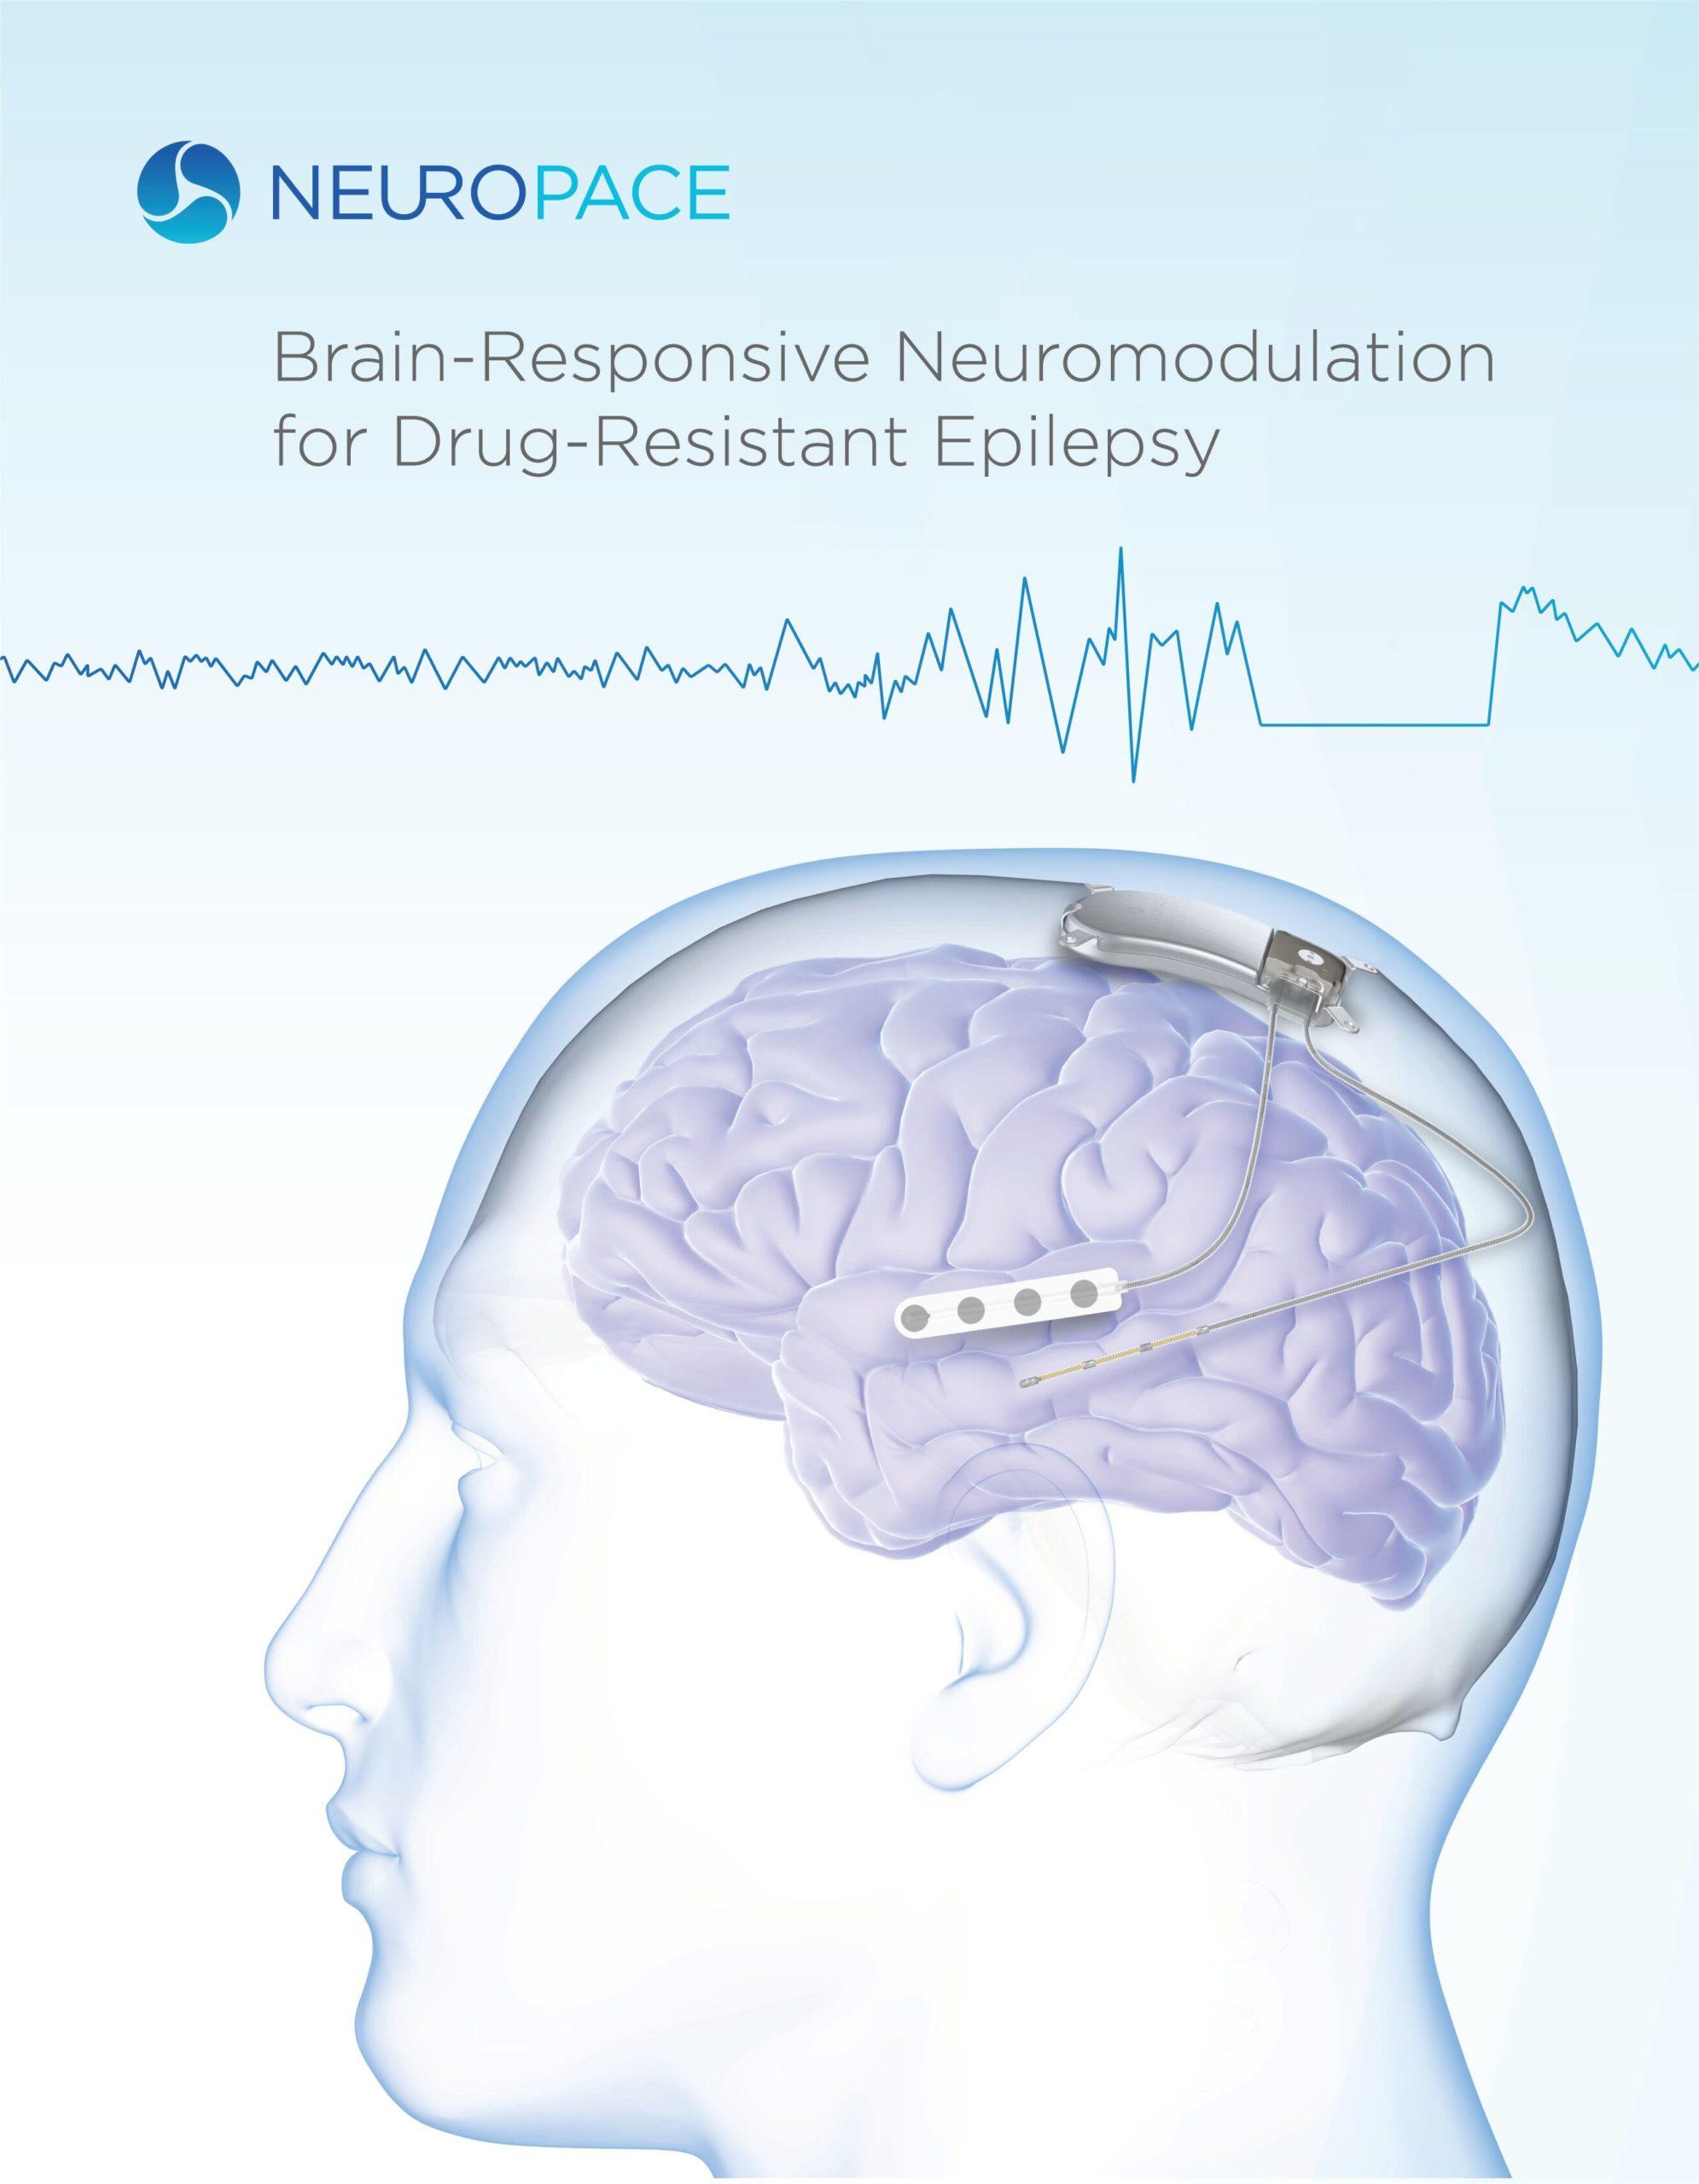 О компании Neuropace Inc.